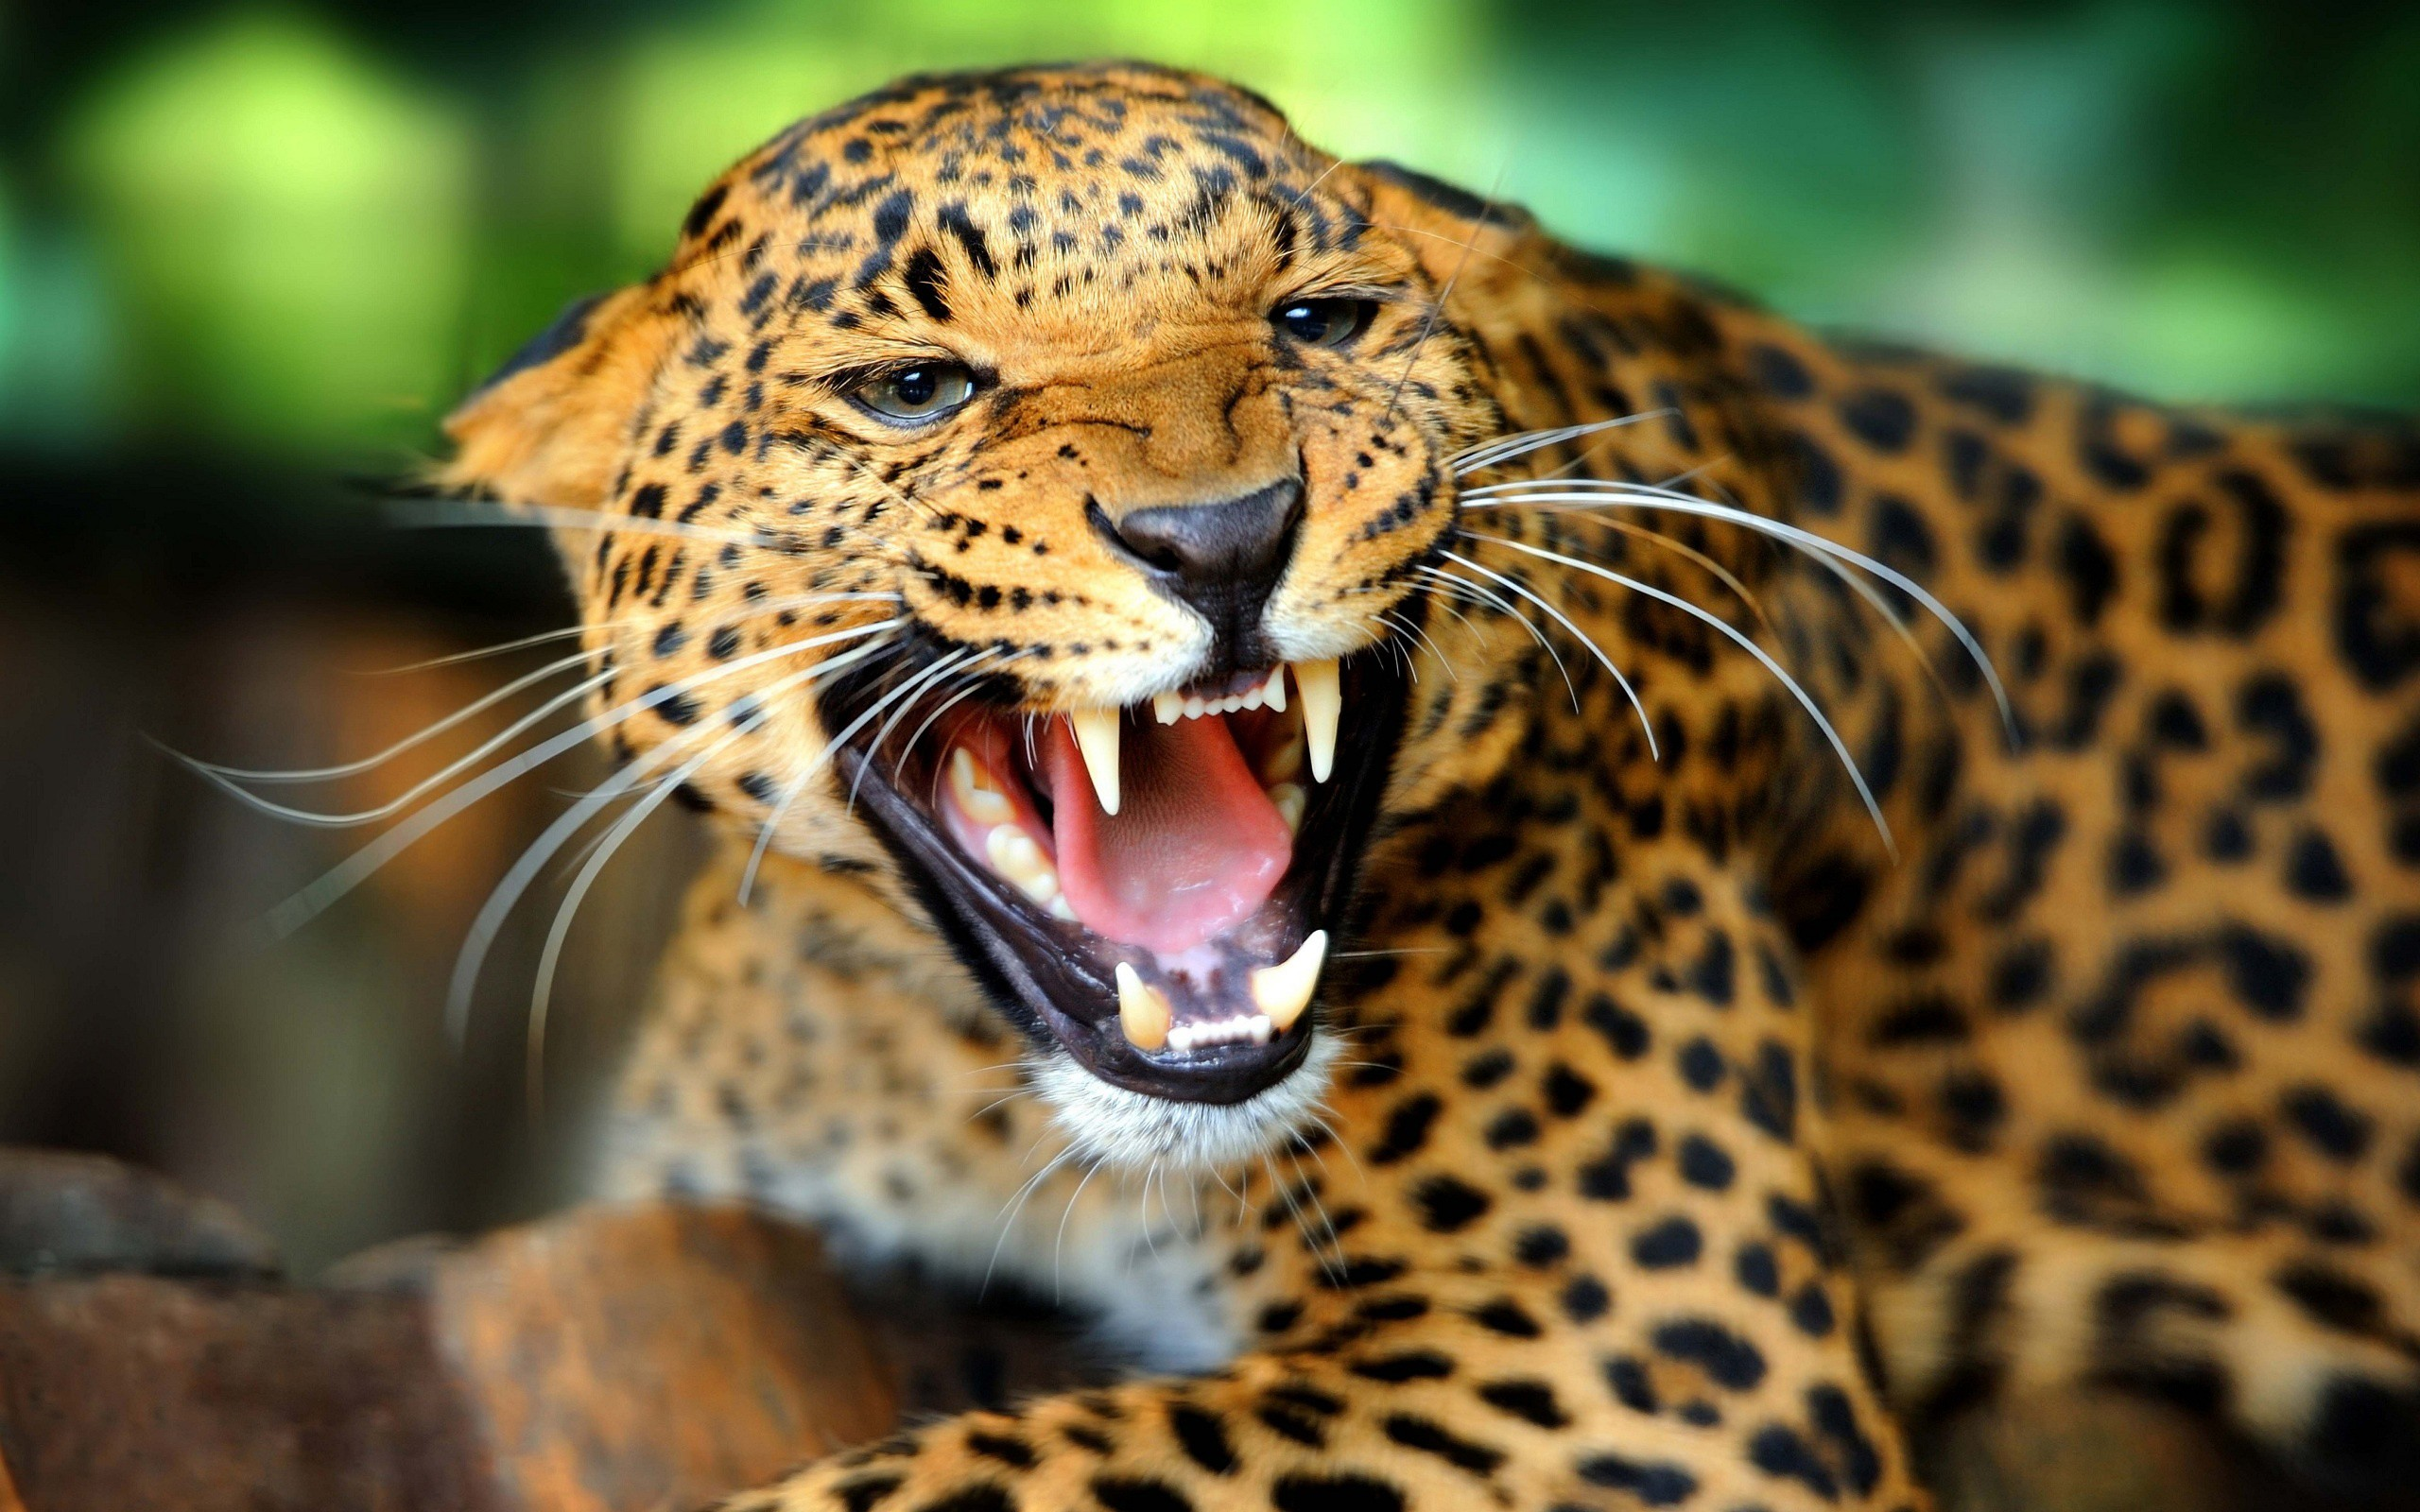 Animal Close Up Wallpaper